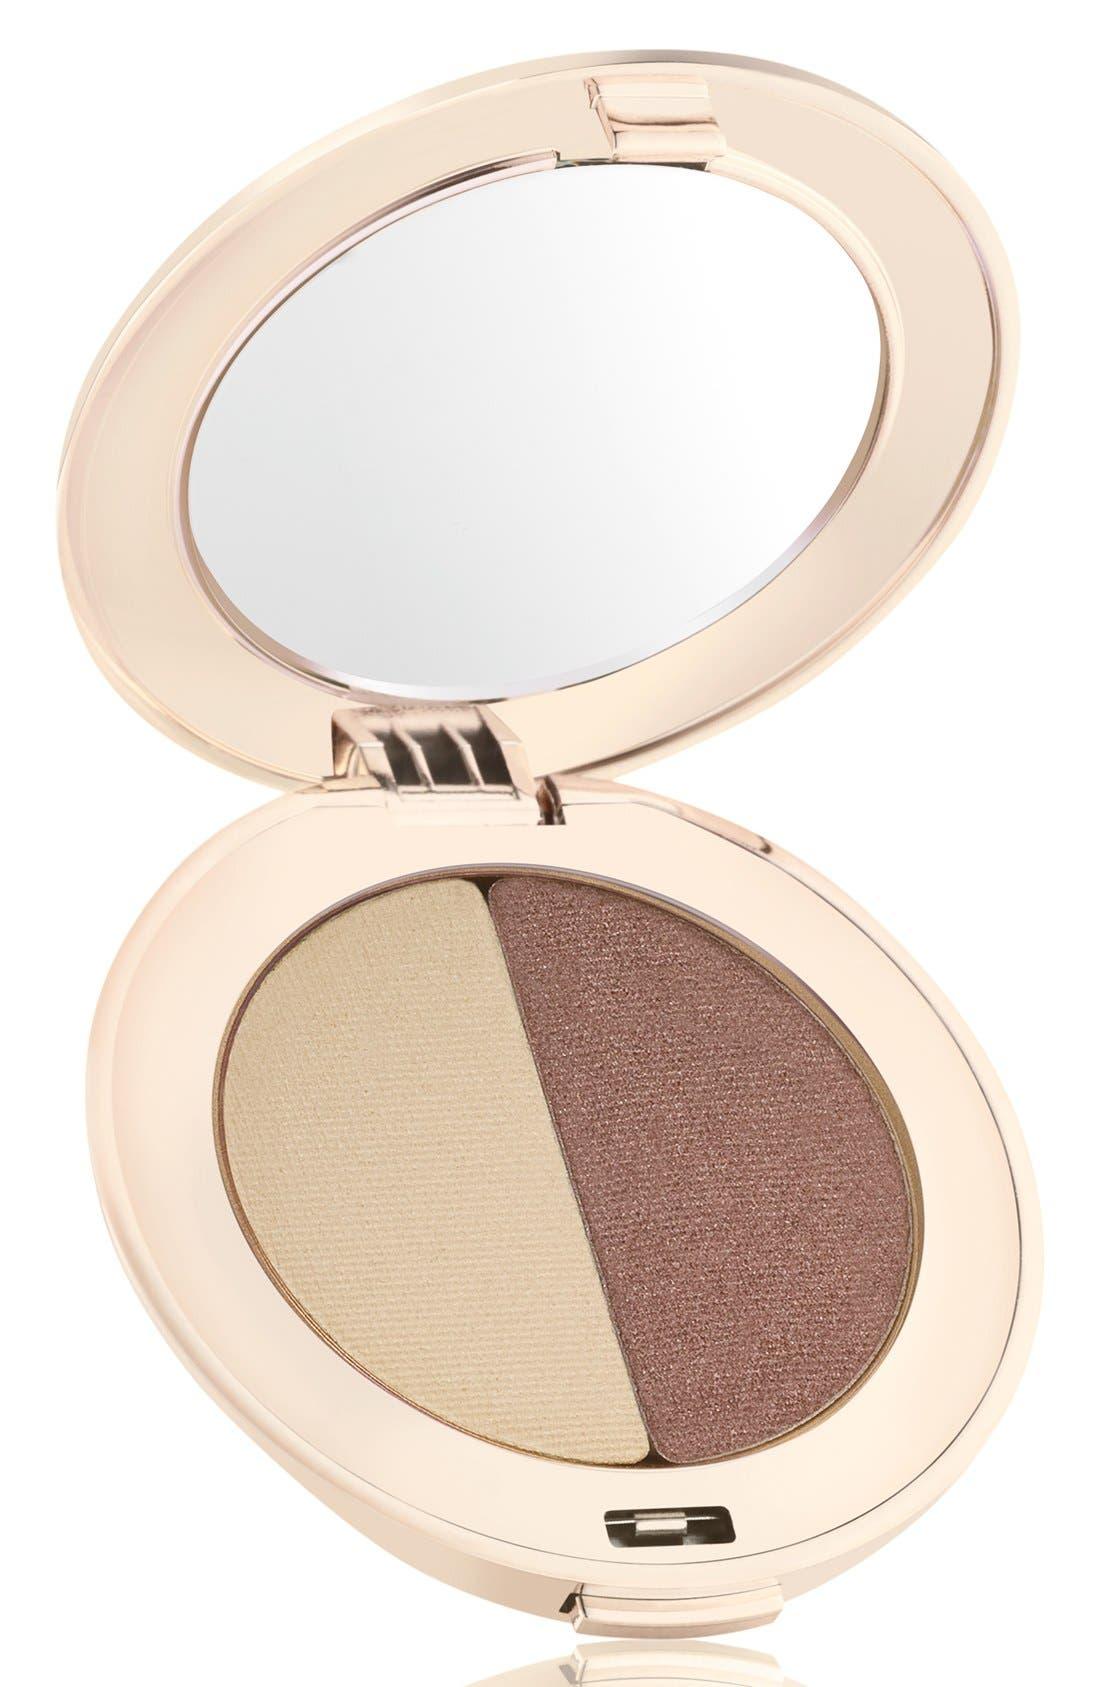 Jane Iredale Cew Beauty Awards Winners Nordstrom Inez Contour Plus Lipstick Riviera Blush